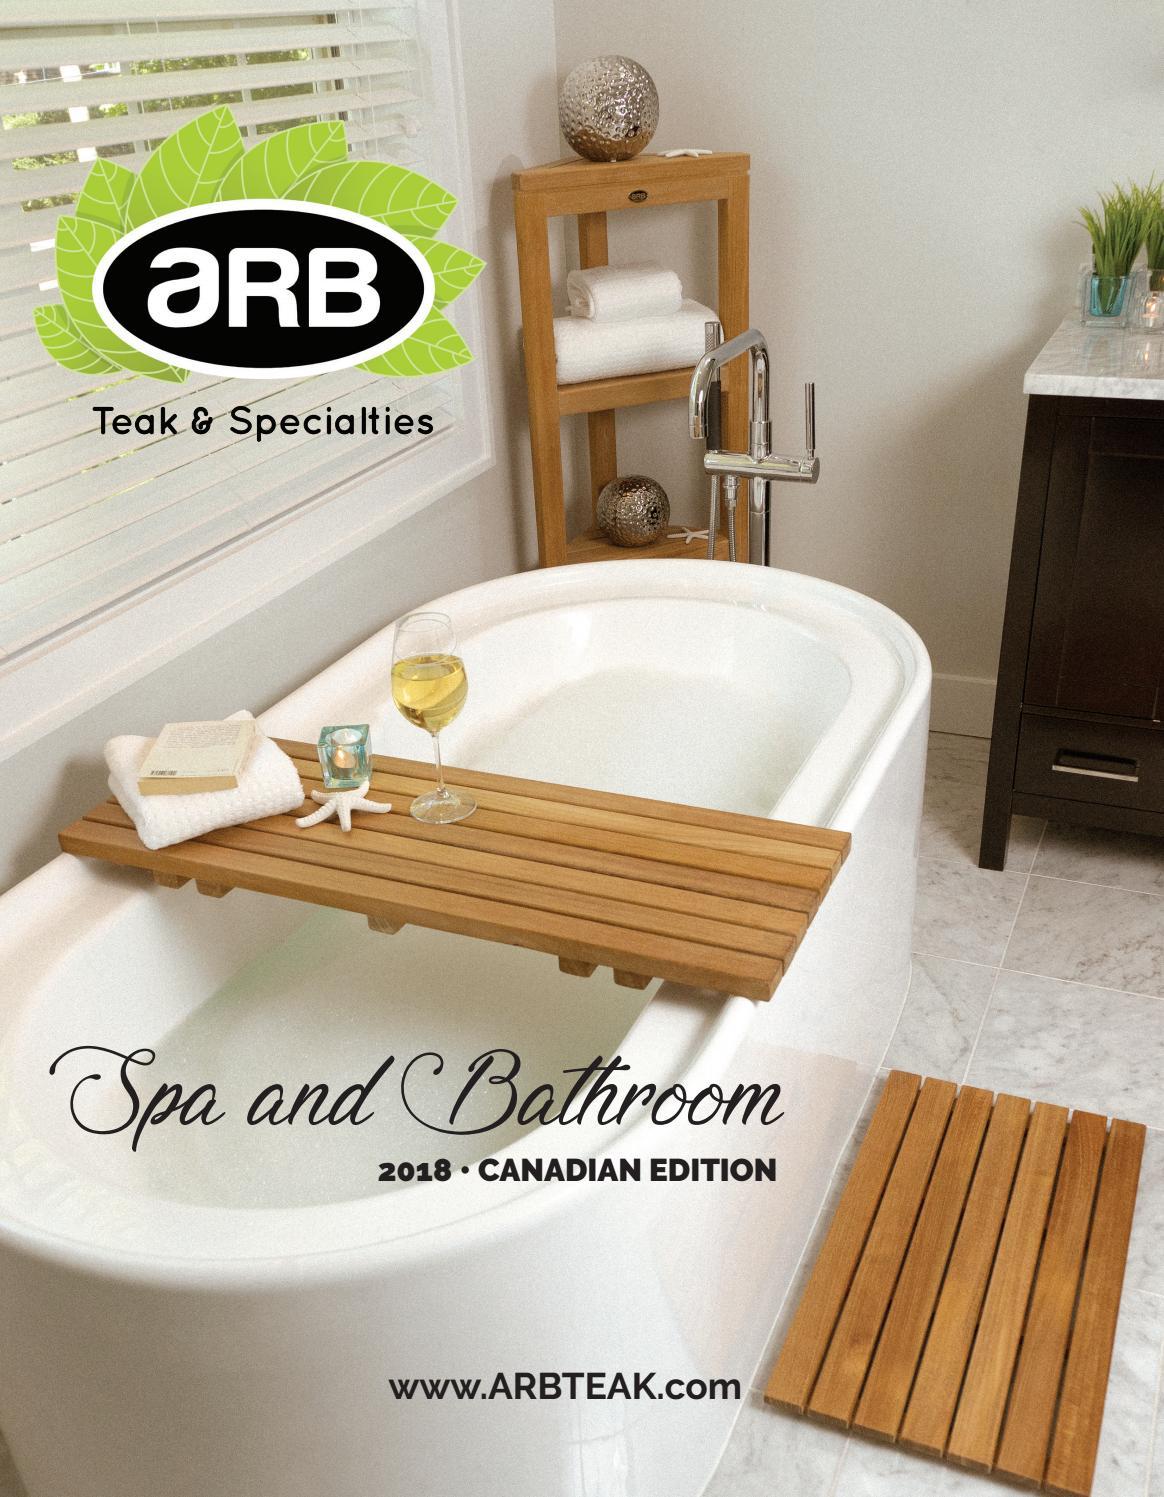 Arb Teak 2018 Spa And Bathroom Catalog Canada By Arb Teak Specialties Issuu